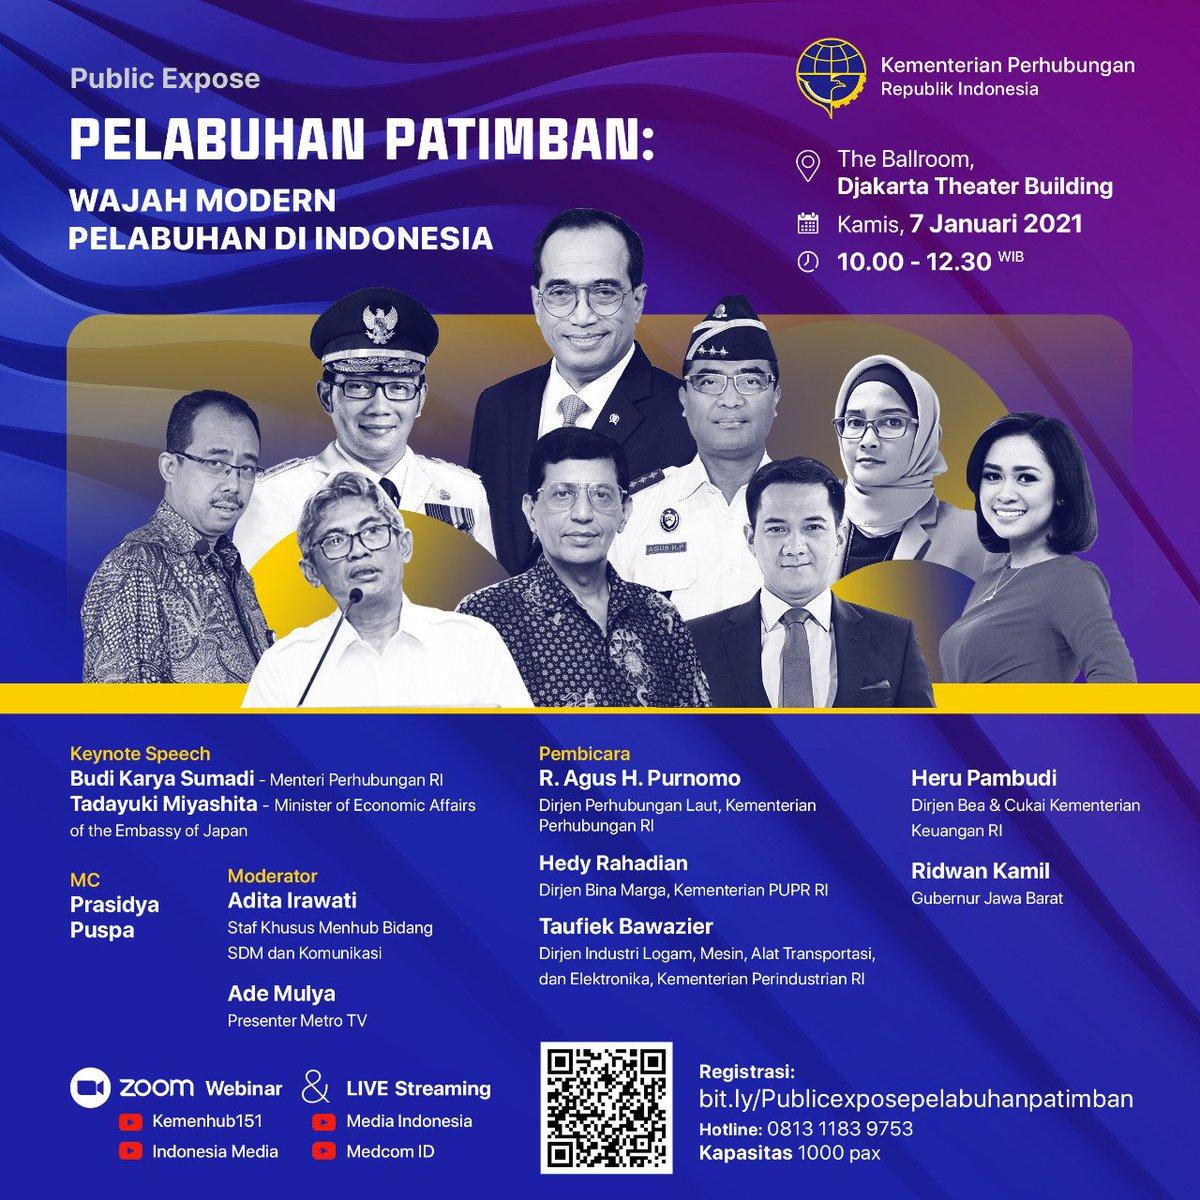 Saksikan live streaming Public Expose Pelabuhan Patimban: Wajah Modern Pelabuhan di Indonesia yang akan berlangsung pada hari Kamis 7 Januari 2020 pukul 10.00 - 12.30 WIB  #MTVNAD